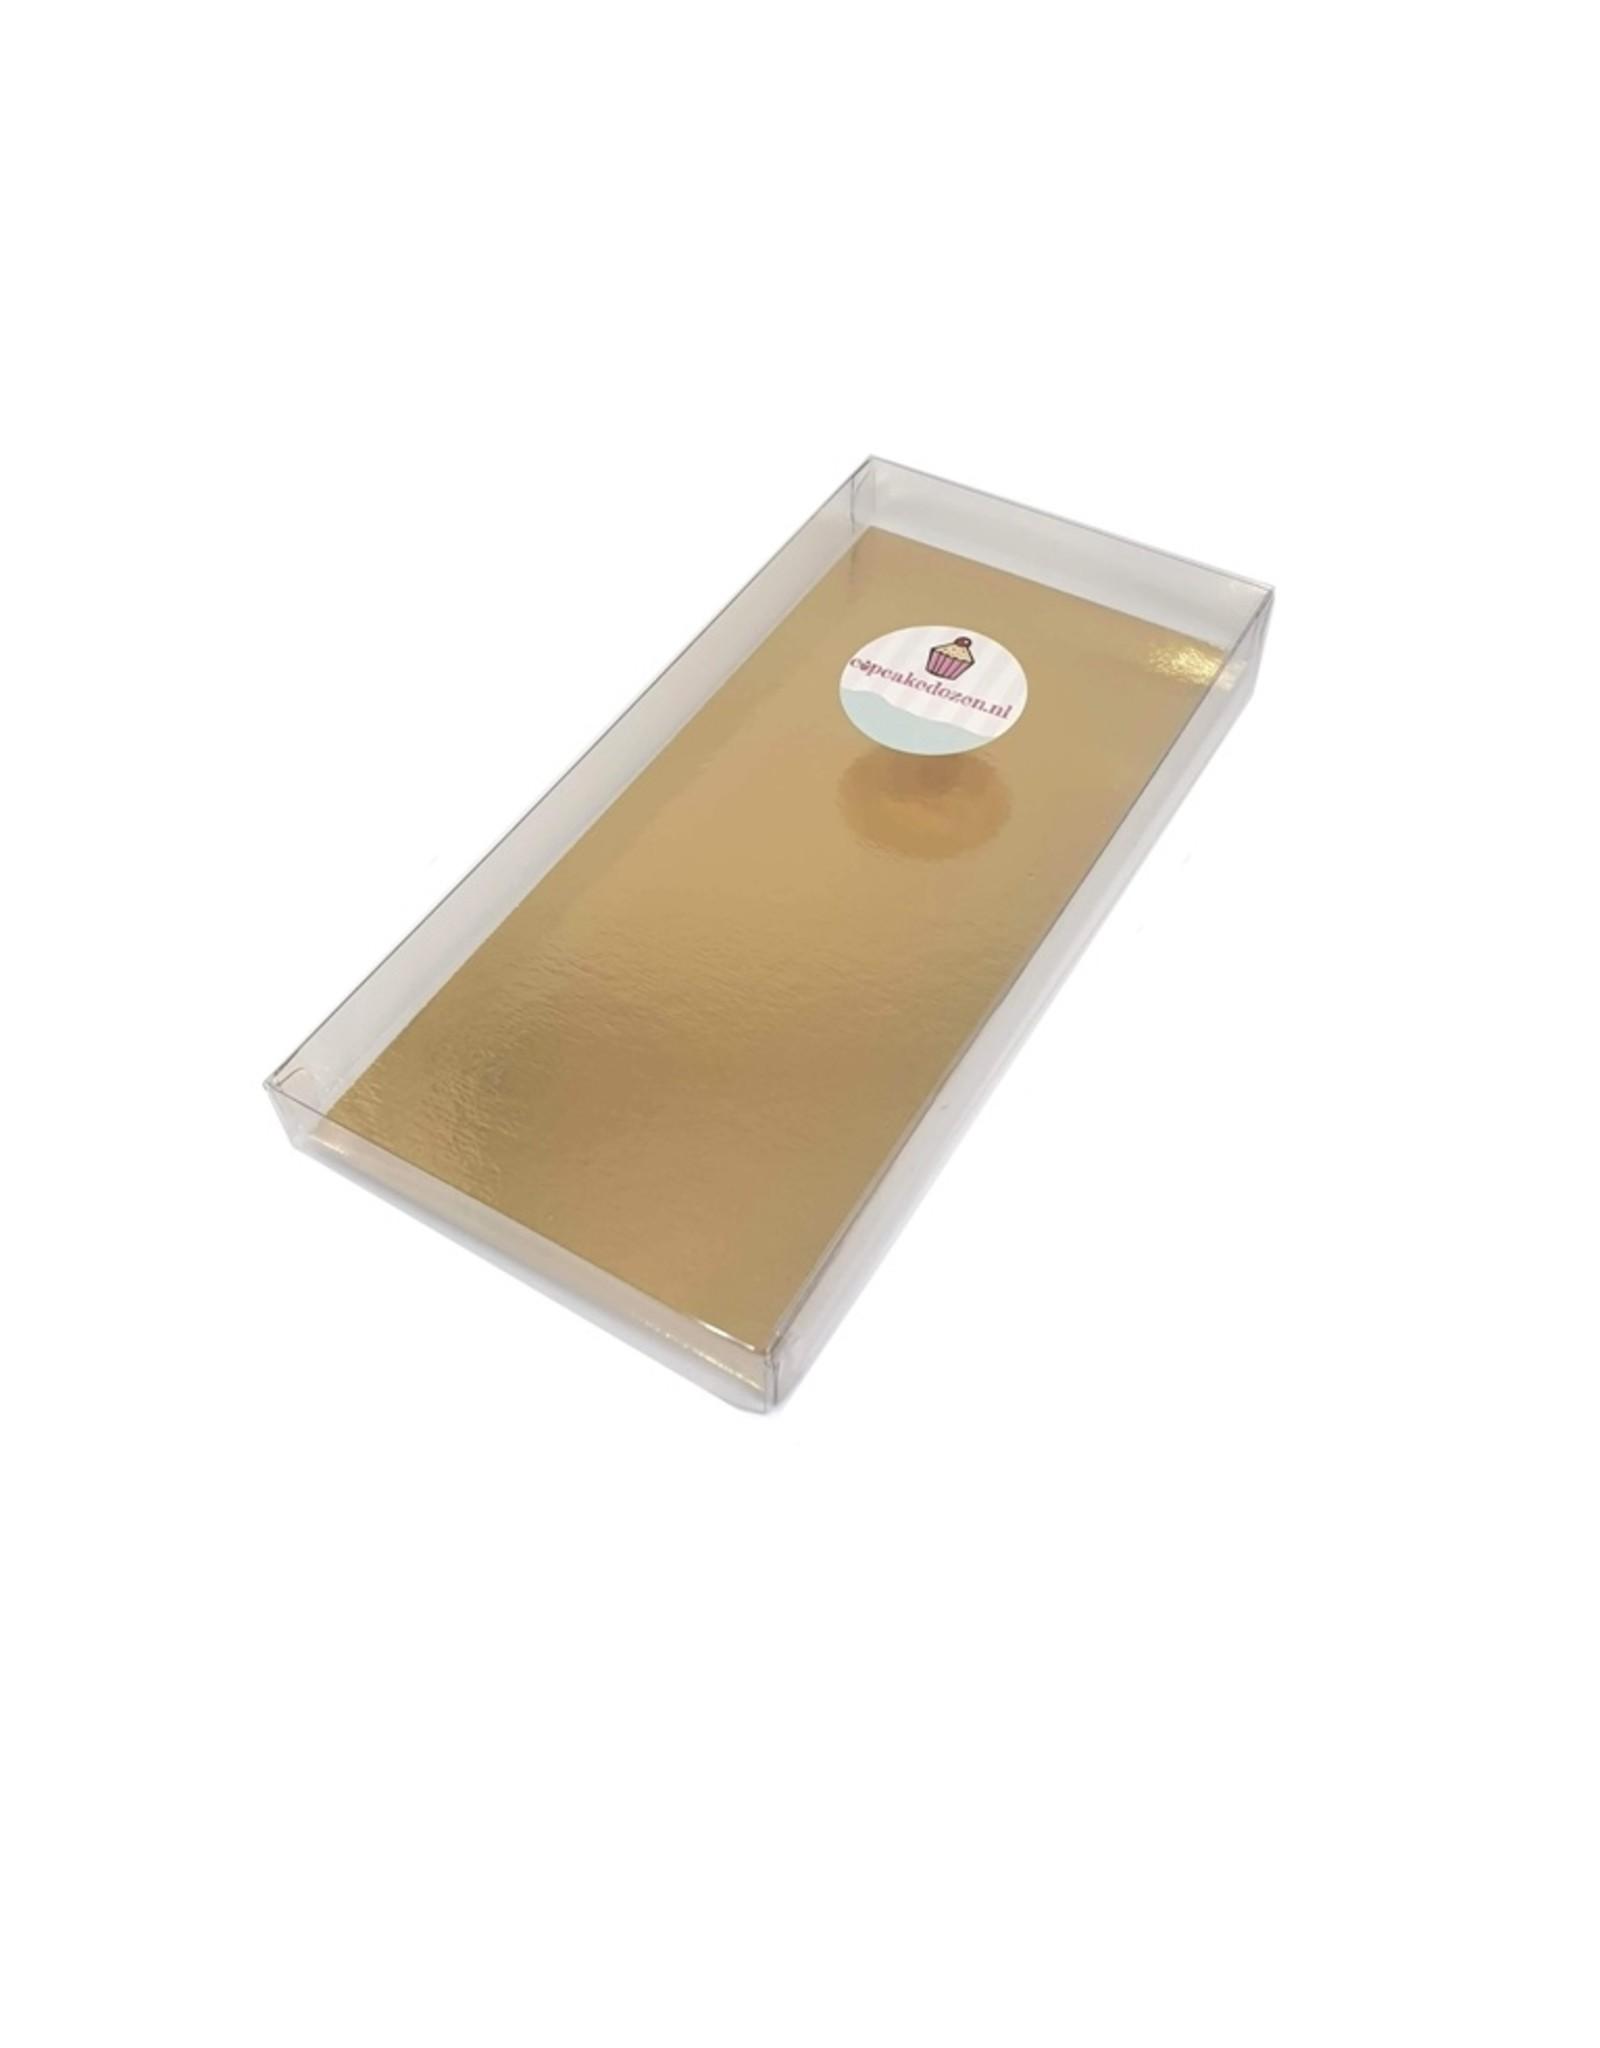 Transparante doos rechthoek laag - diverse maten (per 100 stuks)